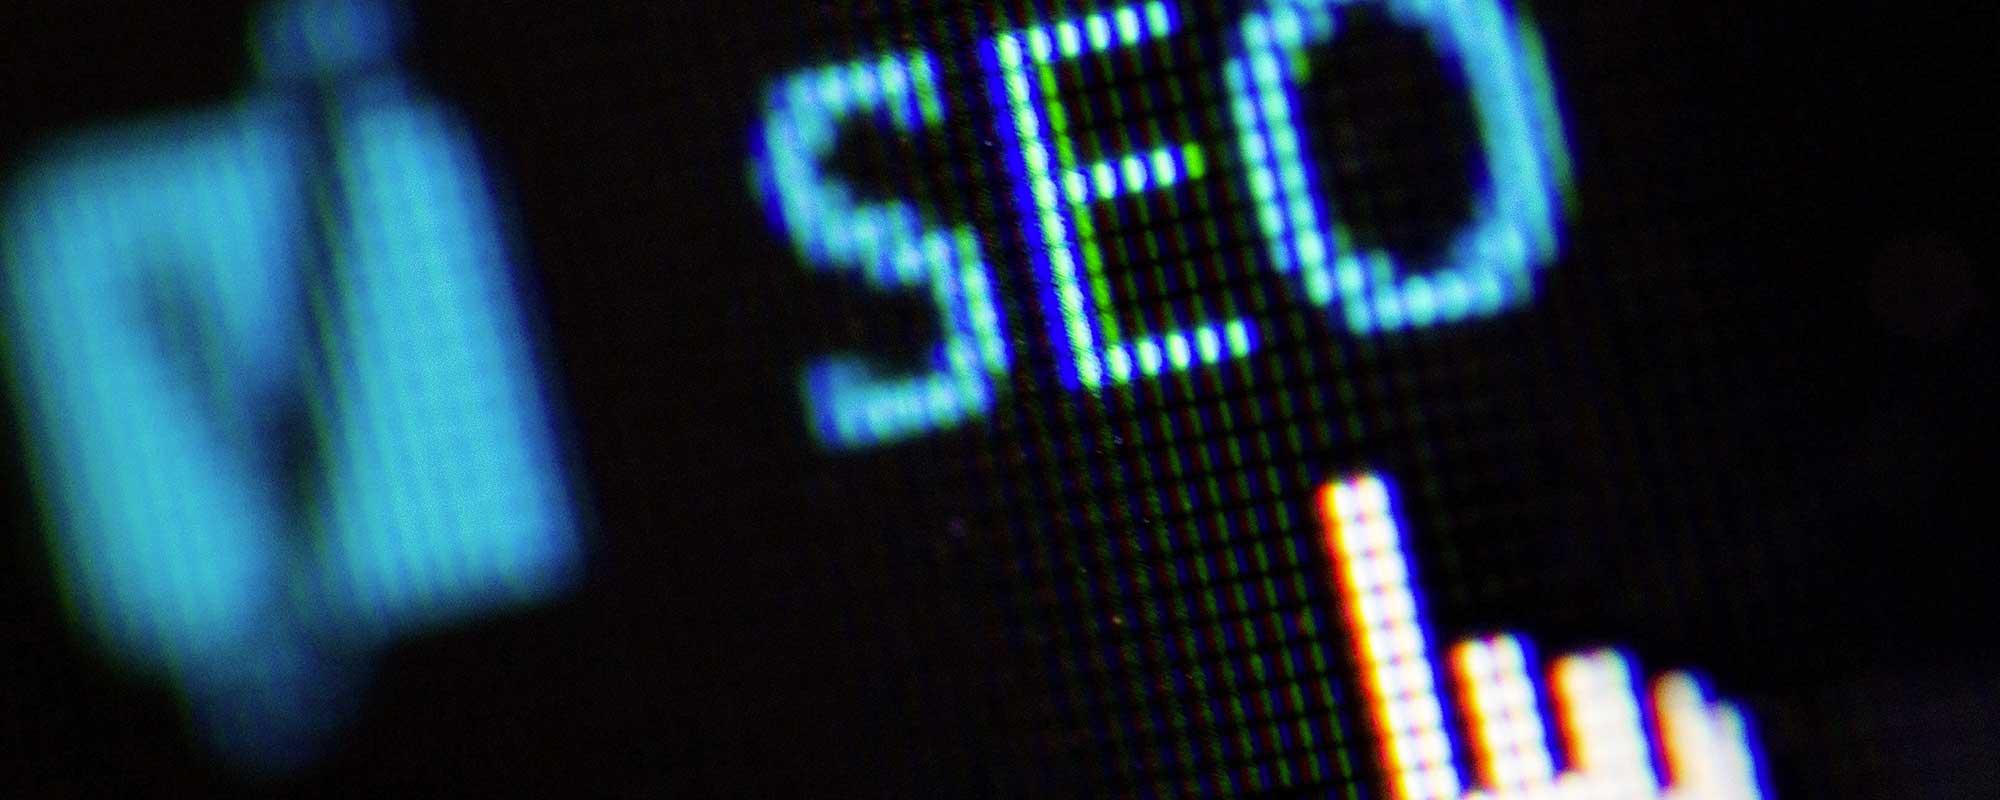 seo-agentur-digital-branding-wirkung